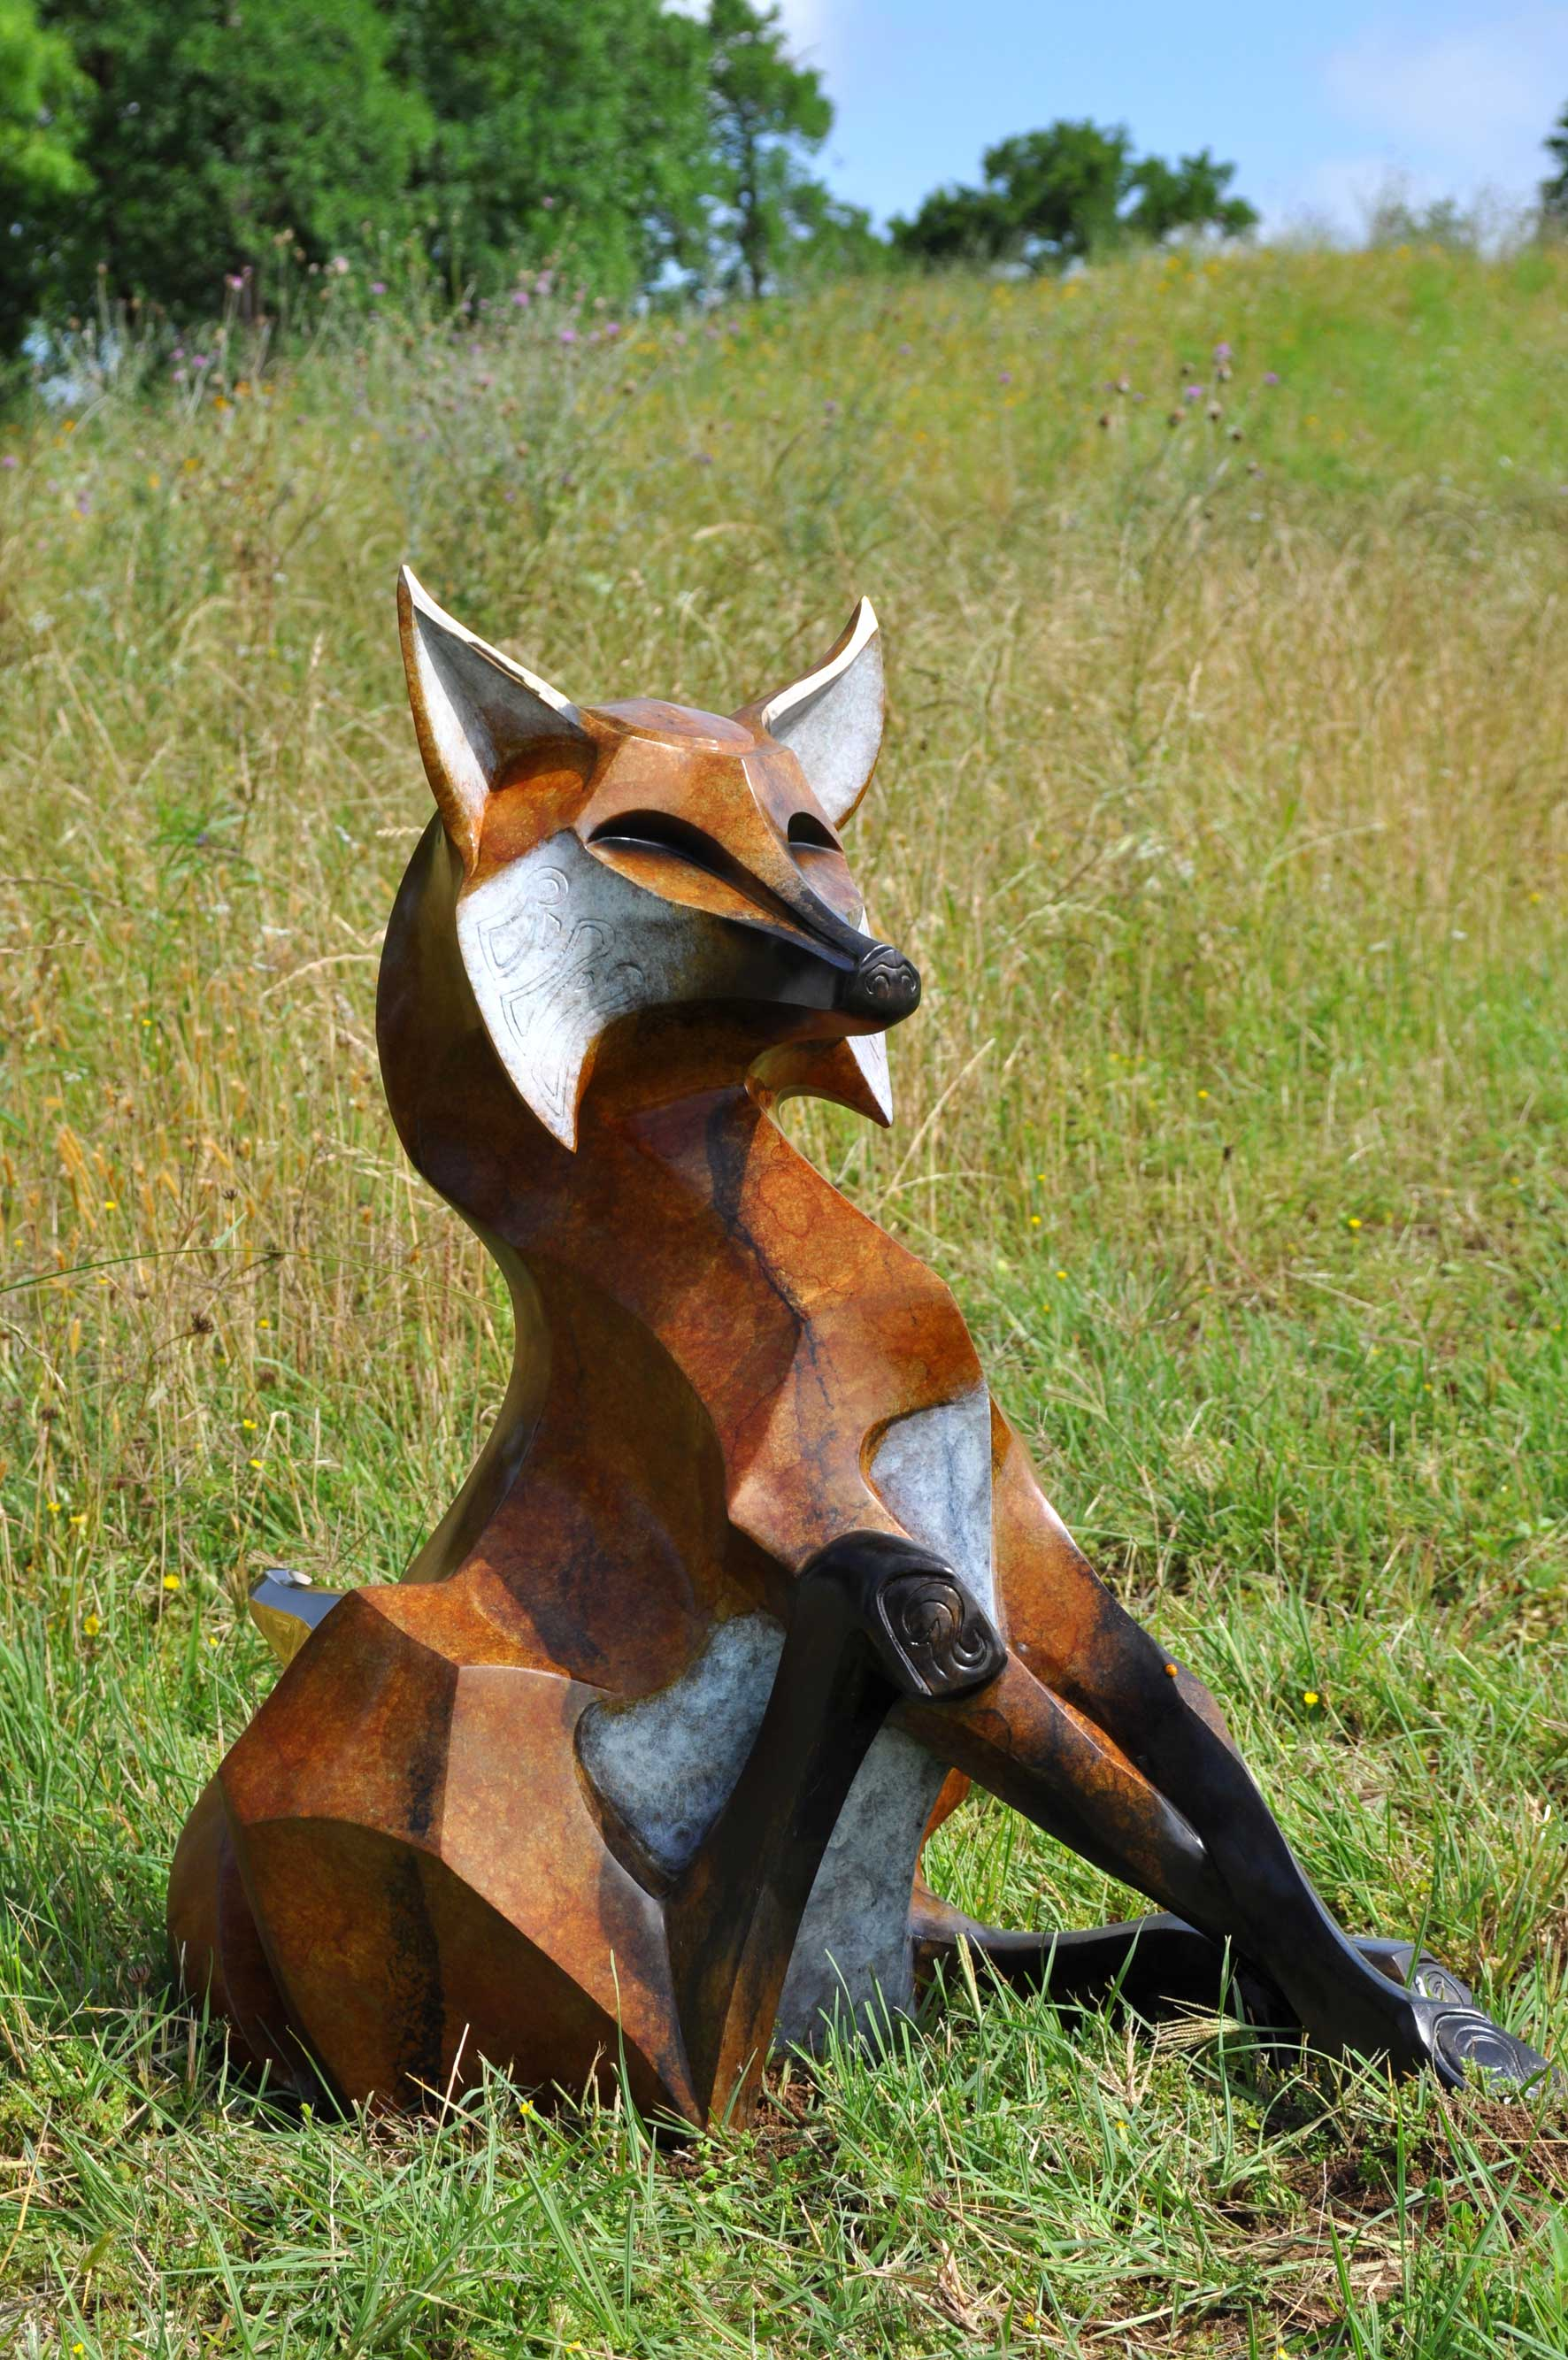 Bronze-Fox-Sculpture-Monument-by-John-Maisano---7.jpg